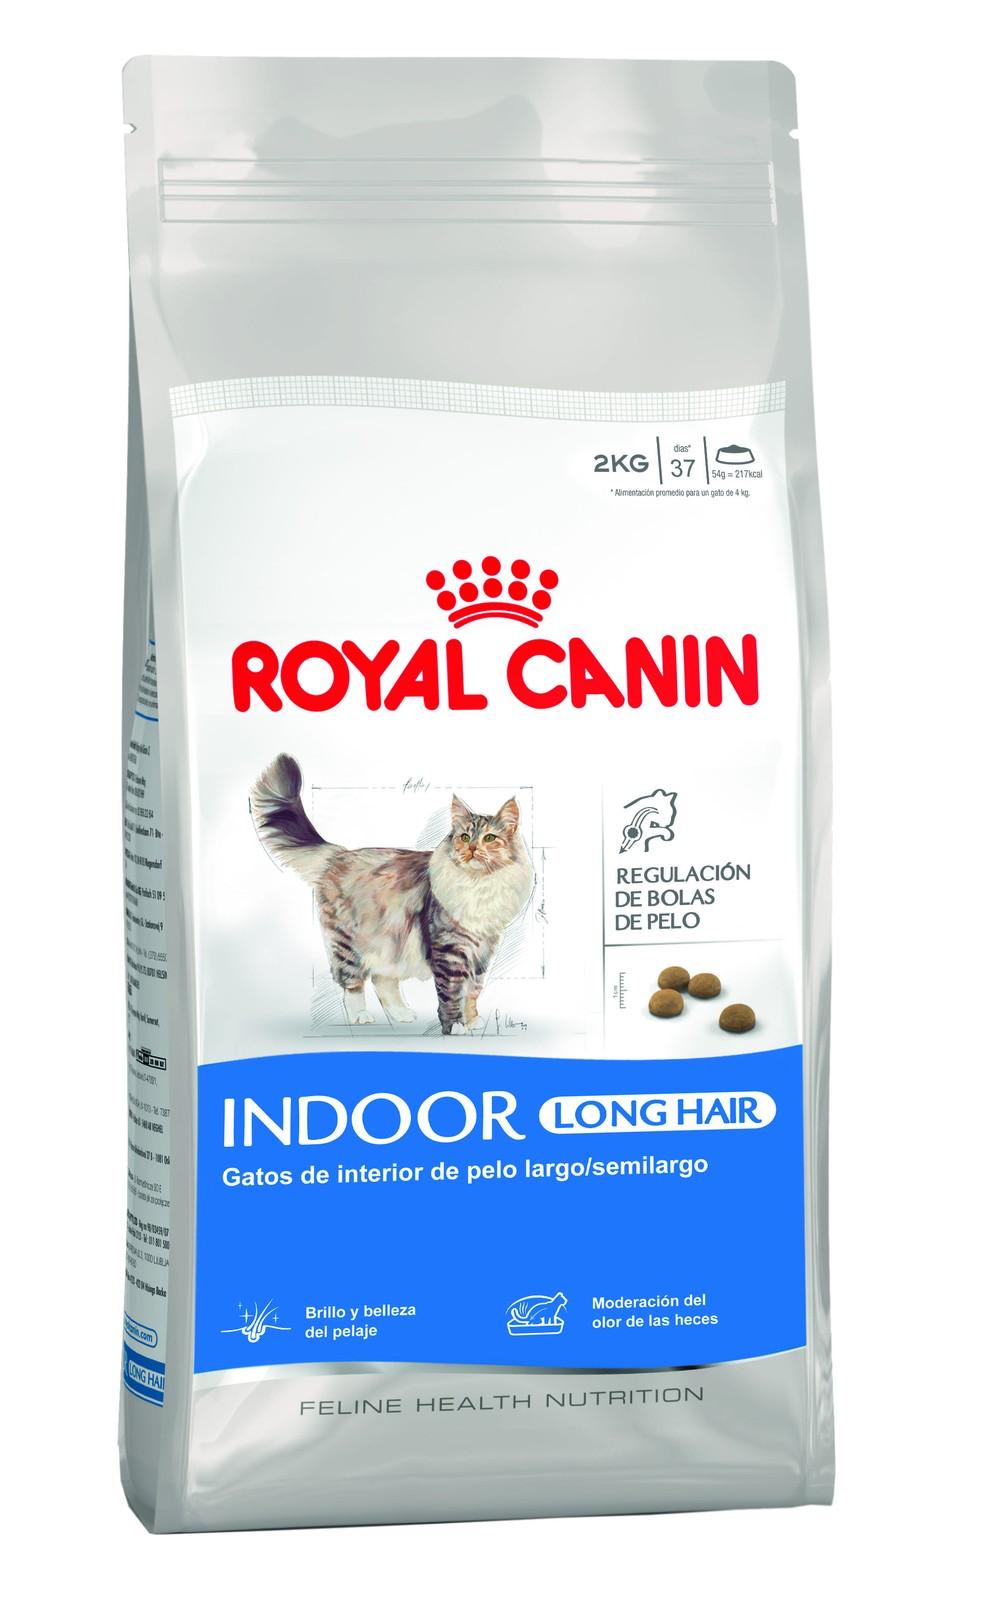 Royal Canin Indoor Long Hair Gato